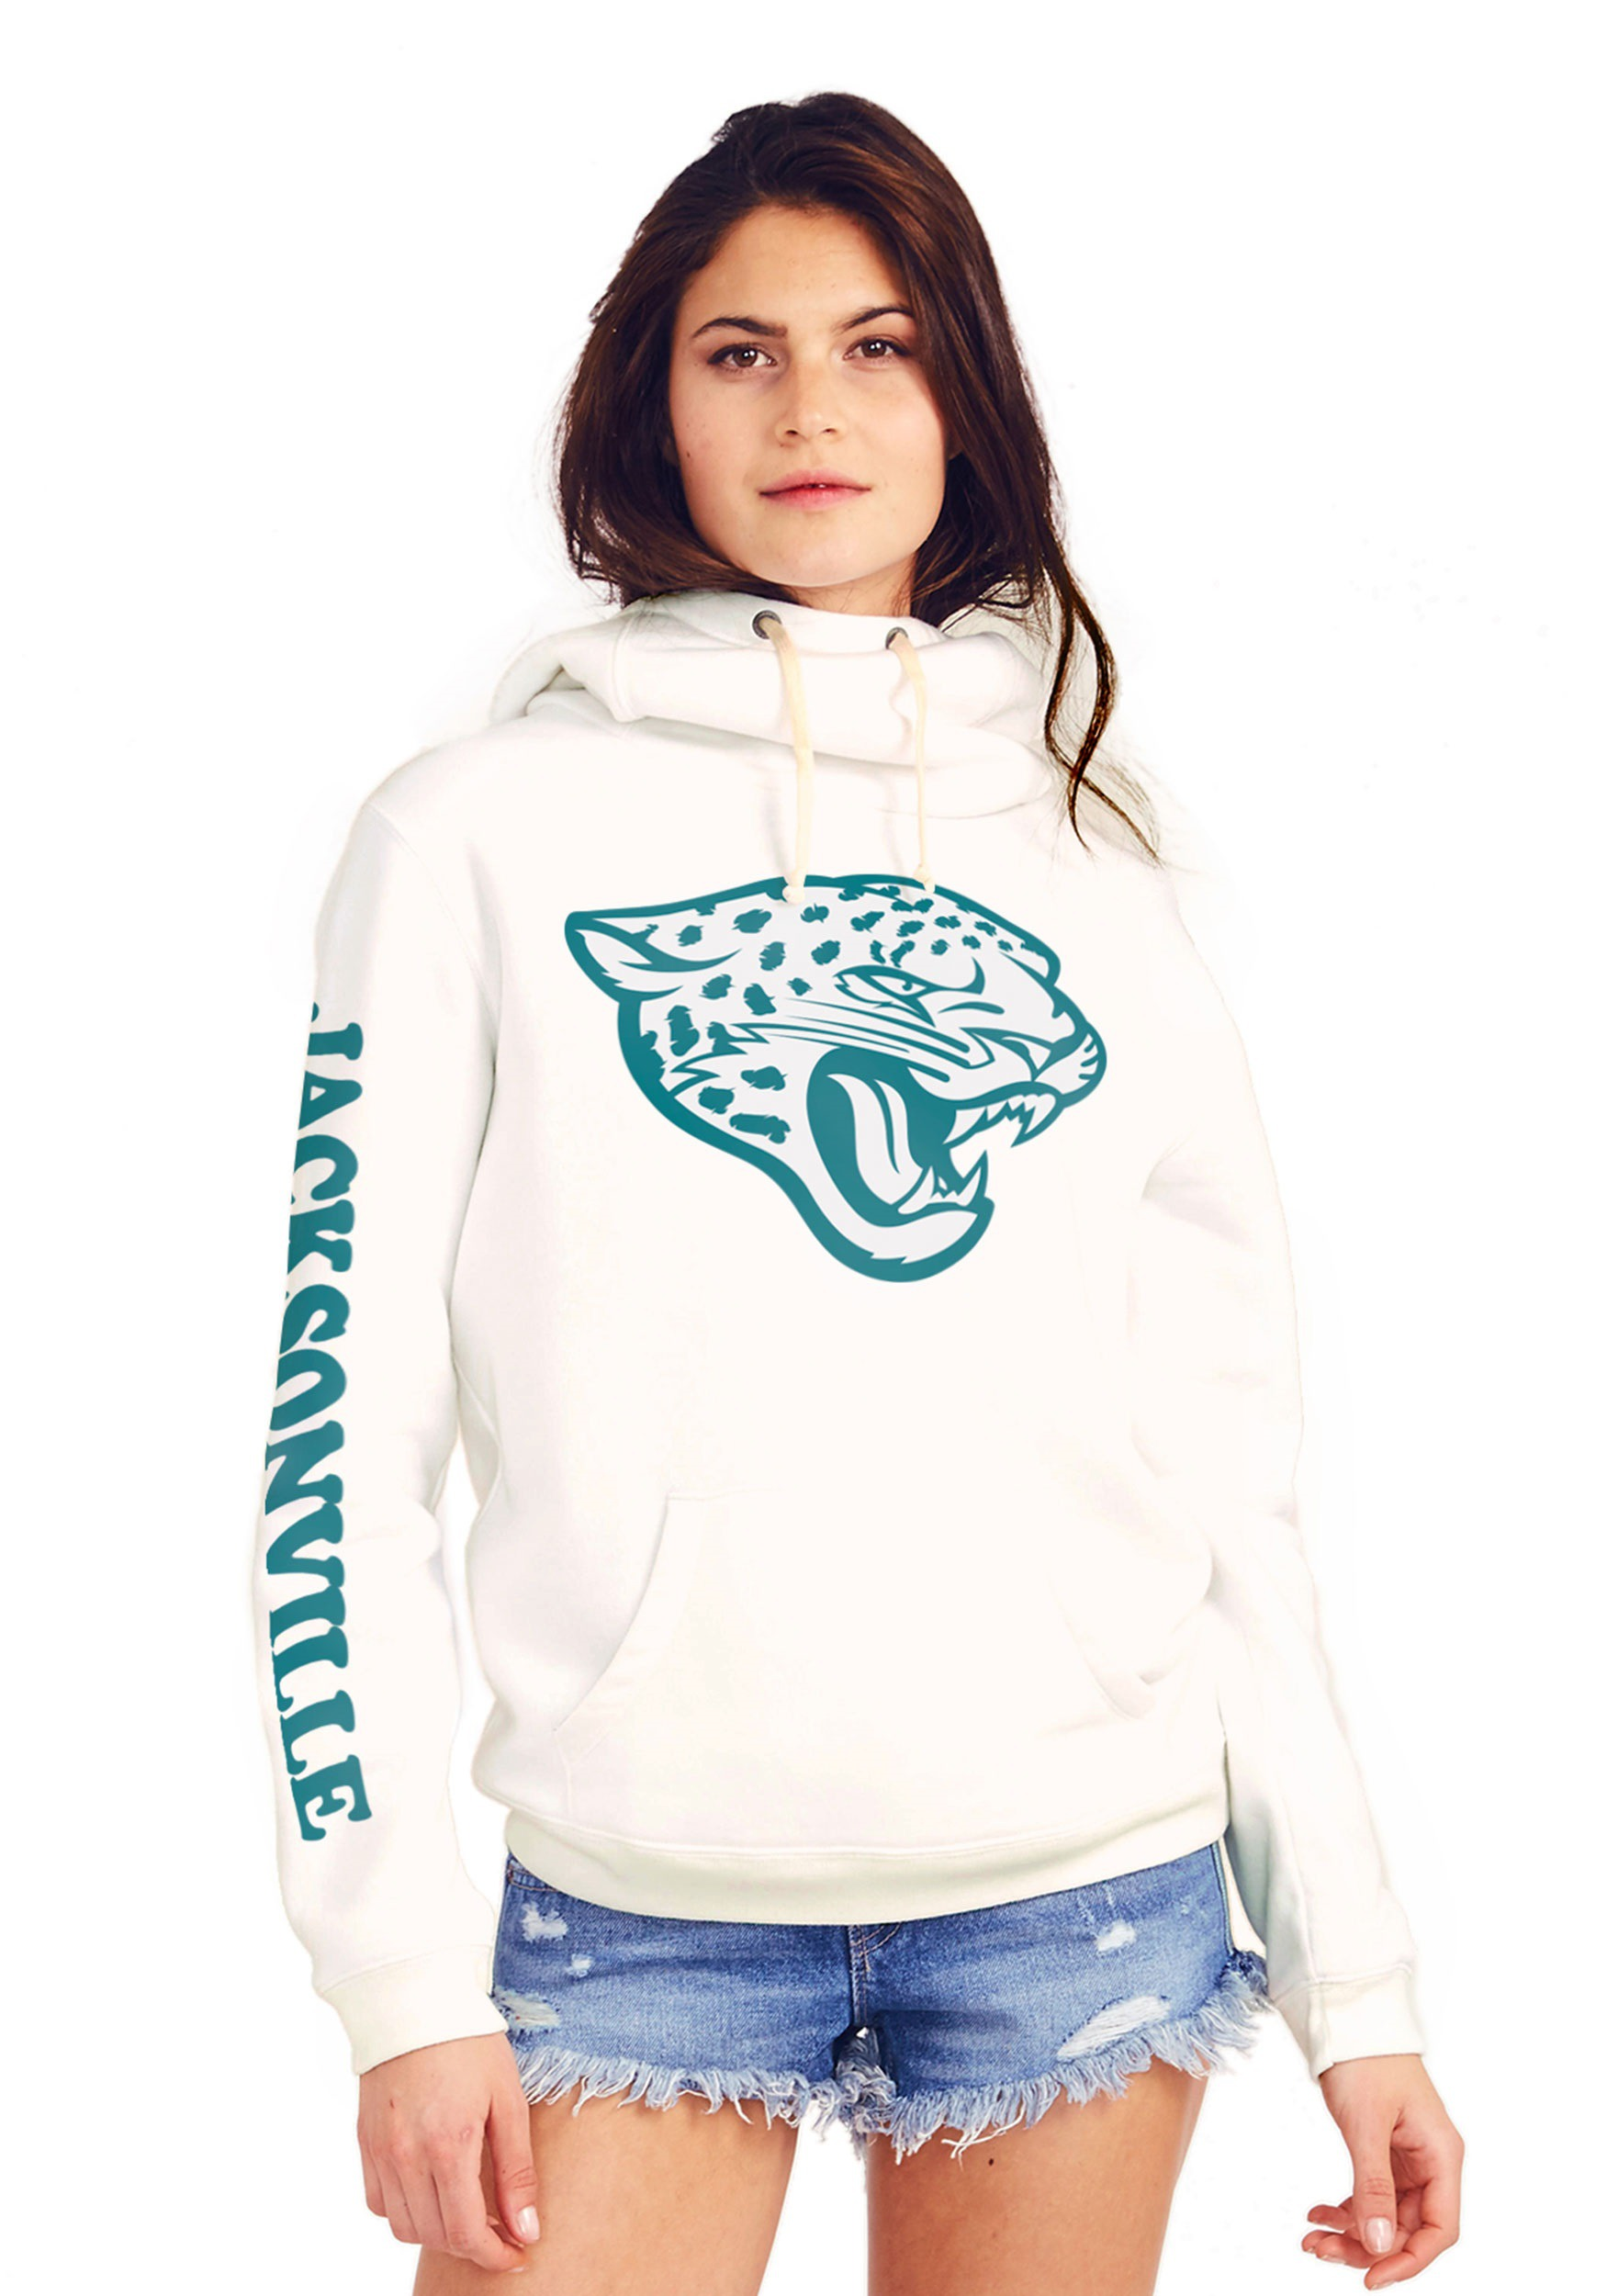 Jacksonville Jaguars Women's Cowl Neck Hooded Sweatshirt